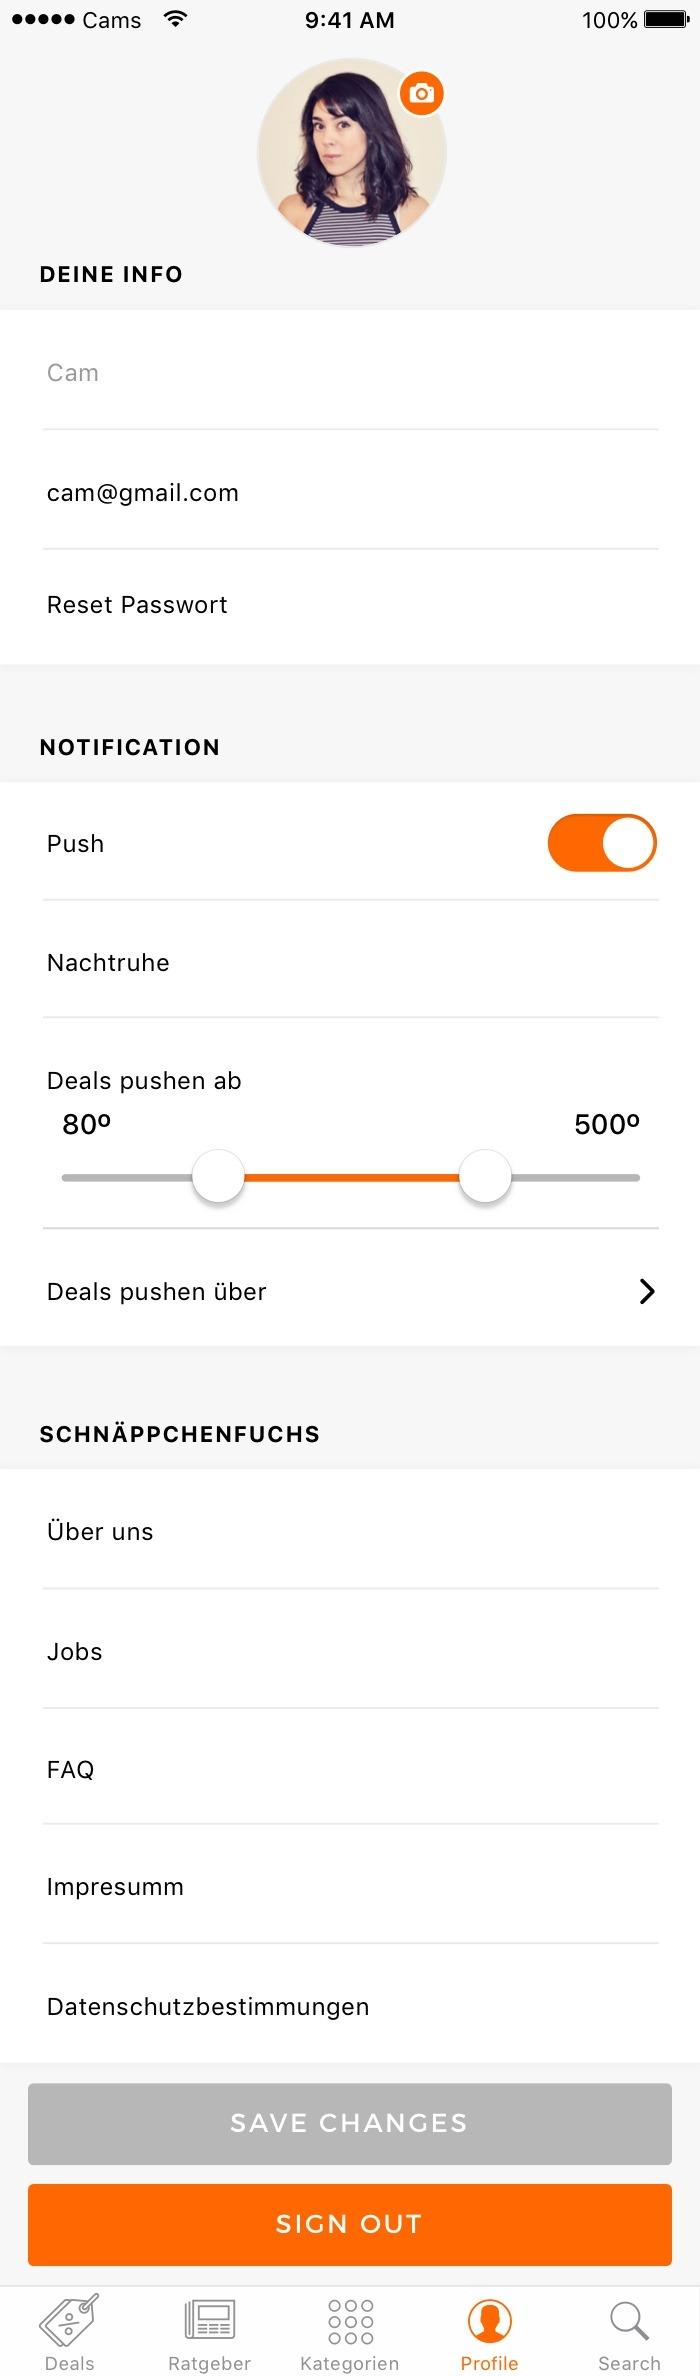 profile-schnaeppchenfuchs